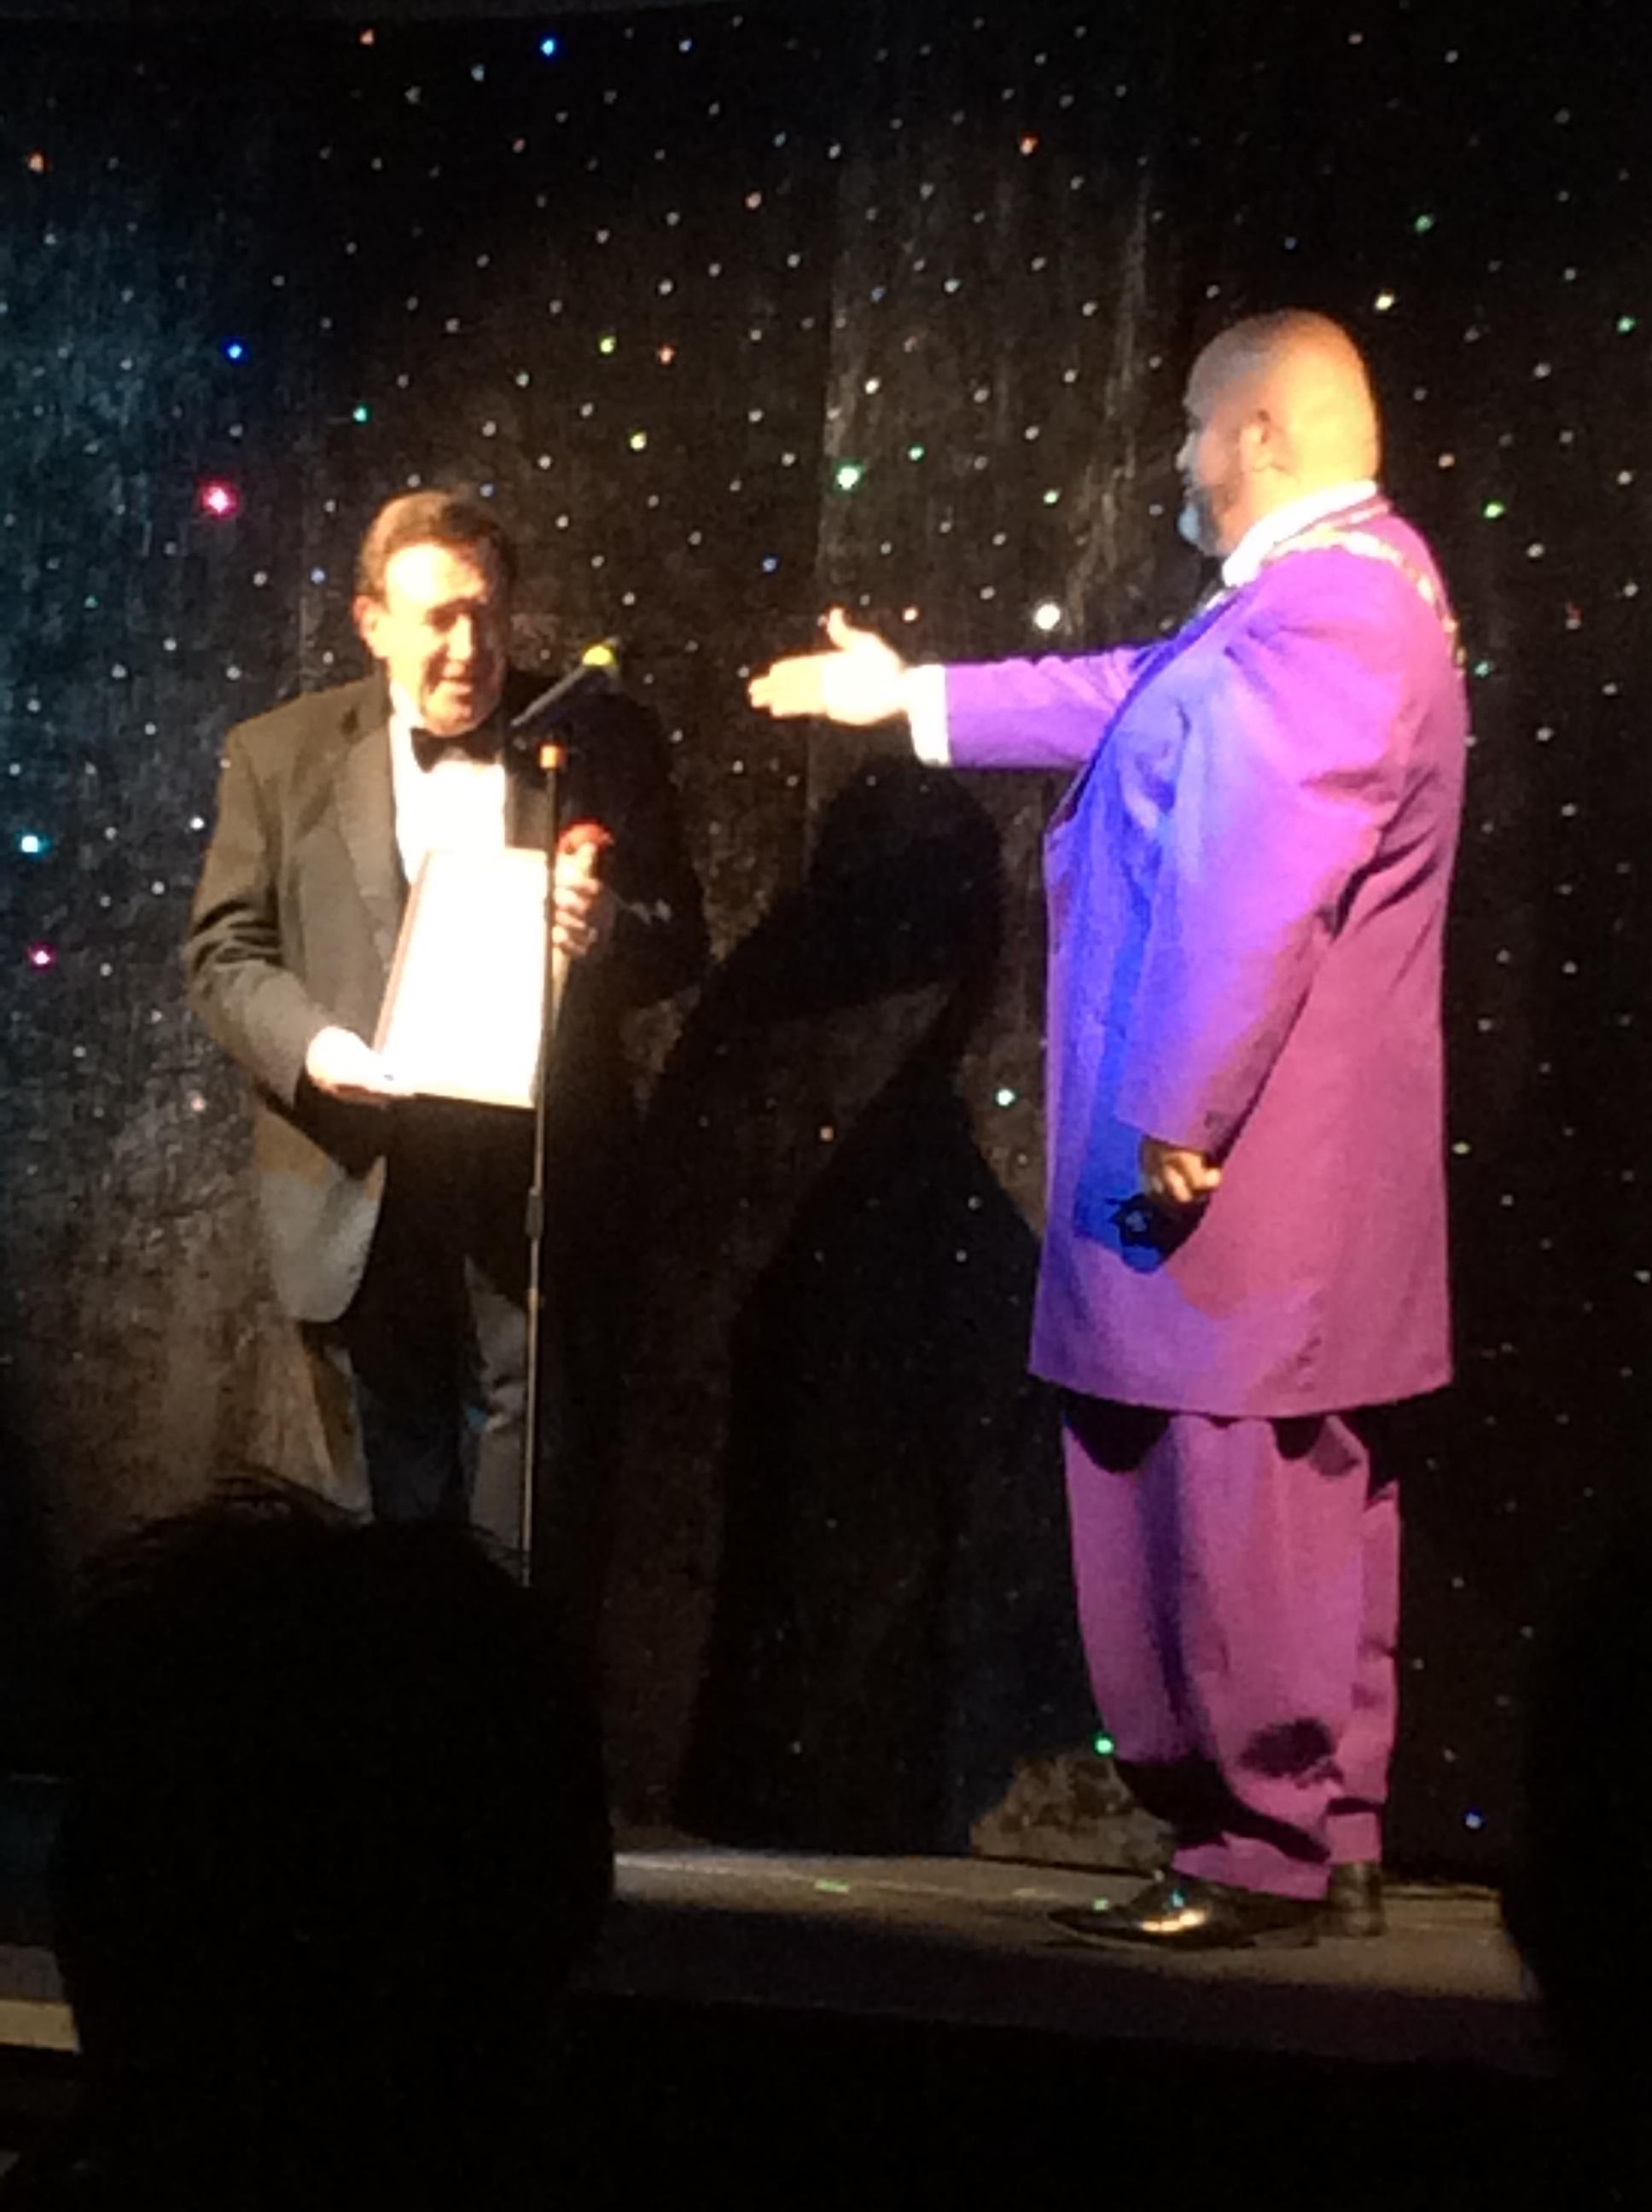 I.B.M. International President, Oscar Munoz awards a Presidential Citation to Scott Holingsworth